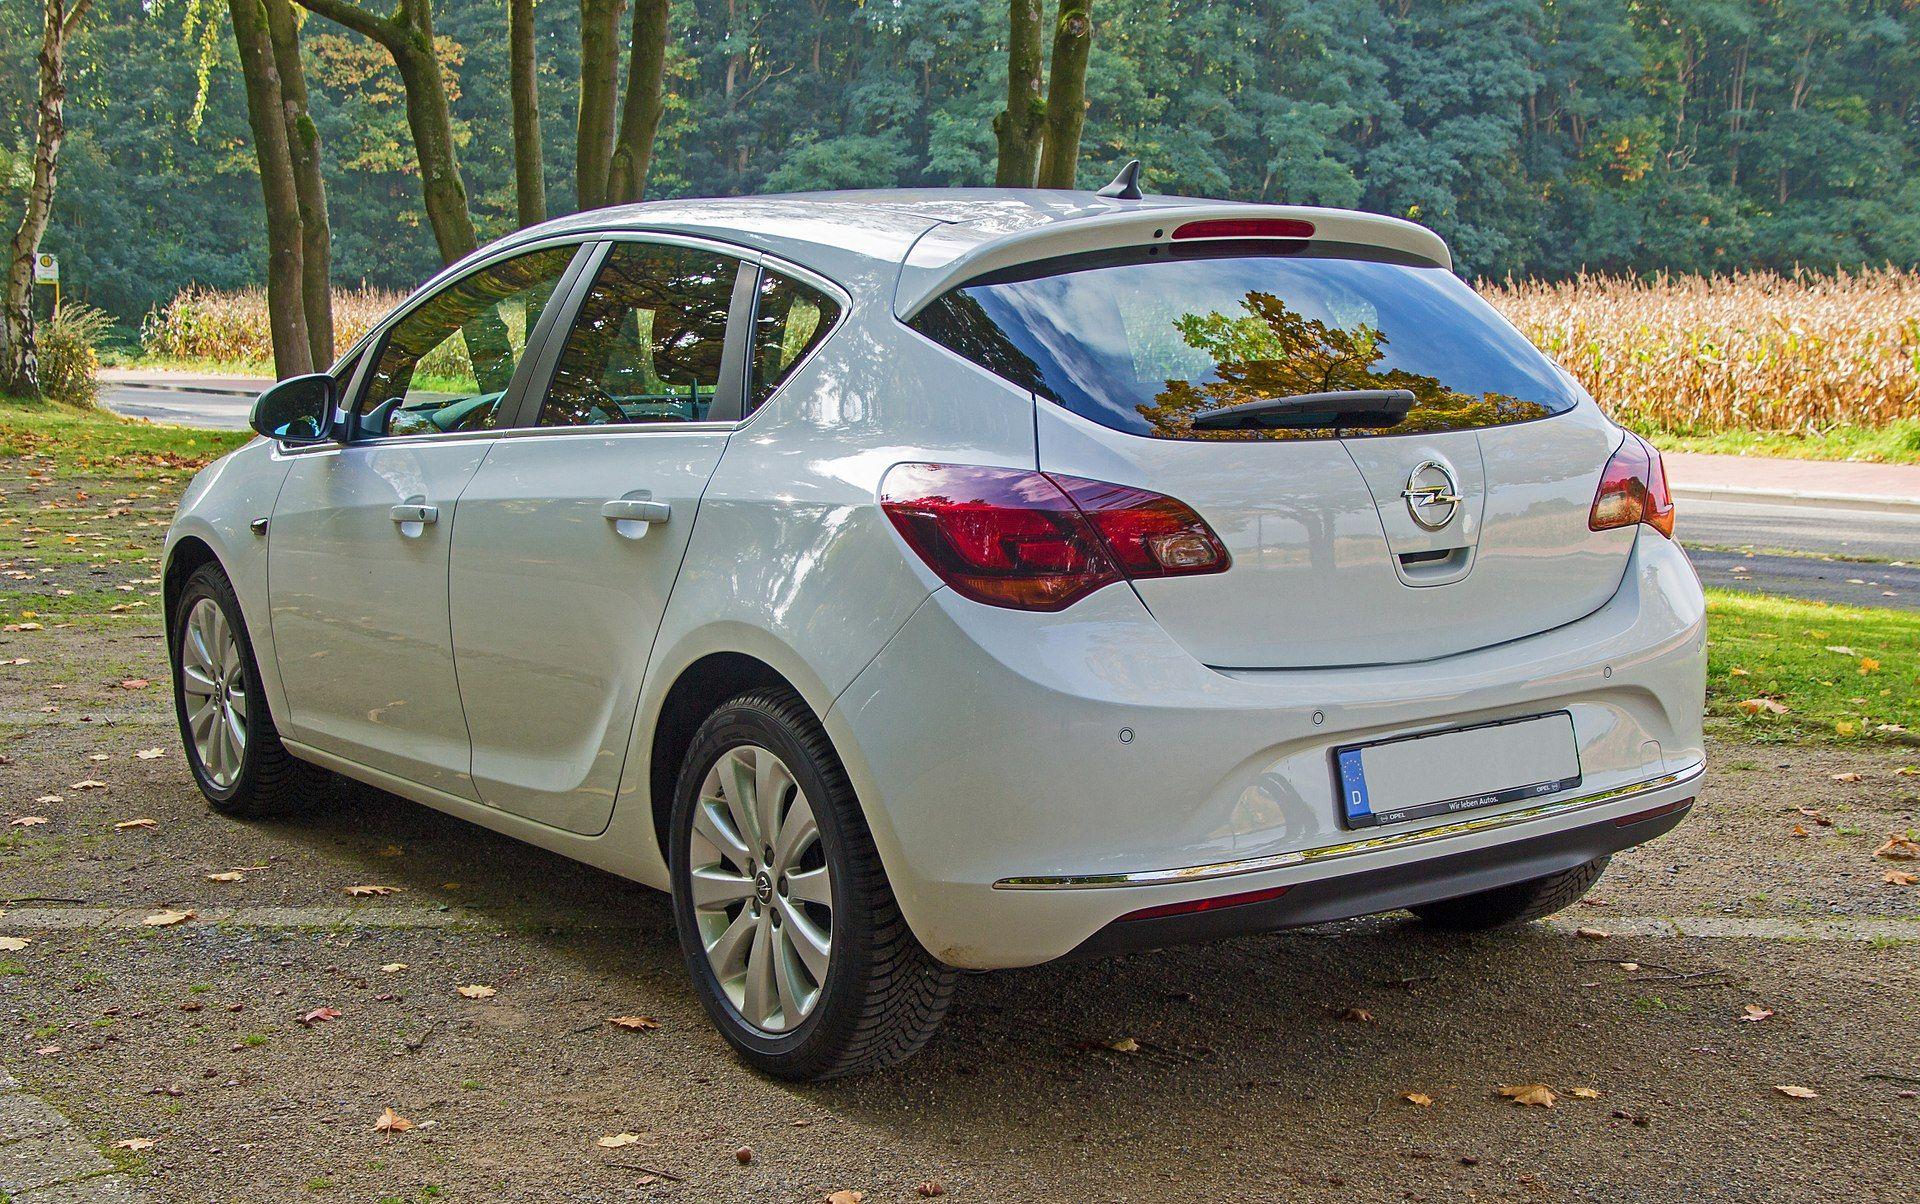 Opel Astra J Modellpflege Heck Opel Astra J Wikipedia